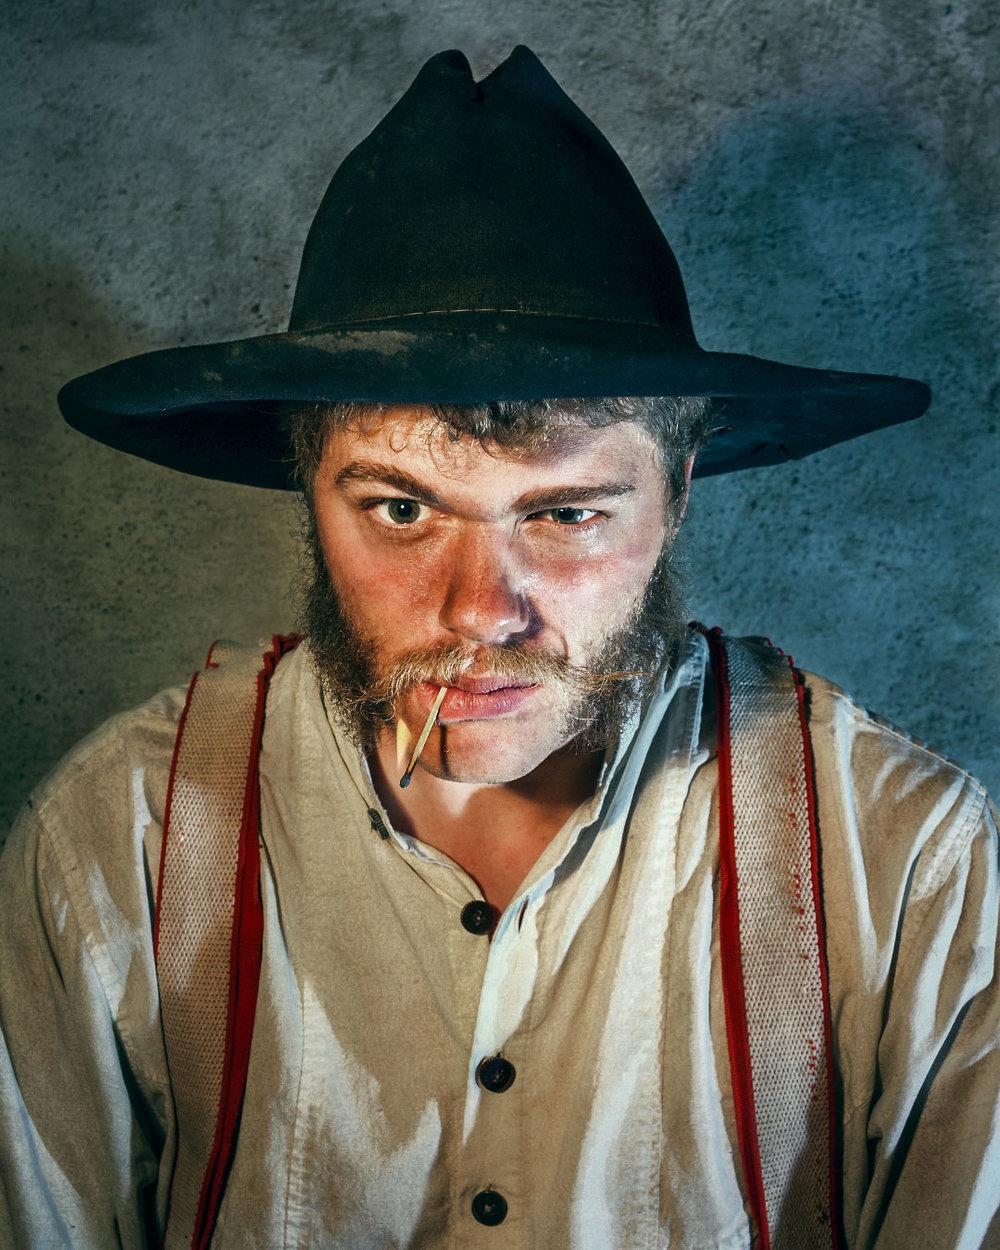 David-Ayliff-Abreu-Philmont-Scout-Ranch-Cimarron-New-Mexico.jpg